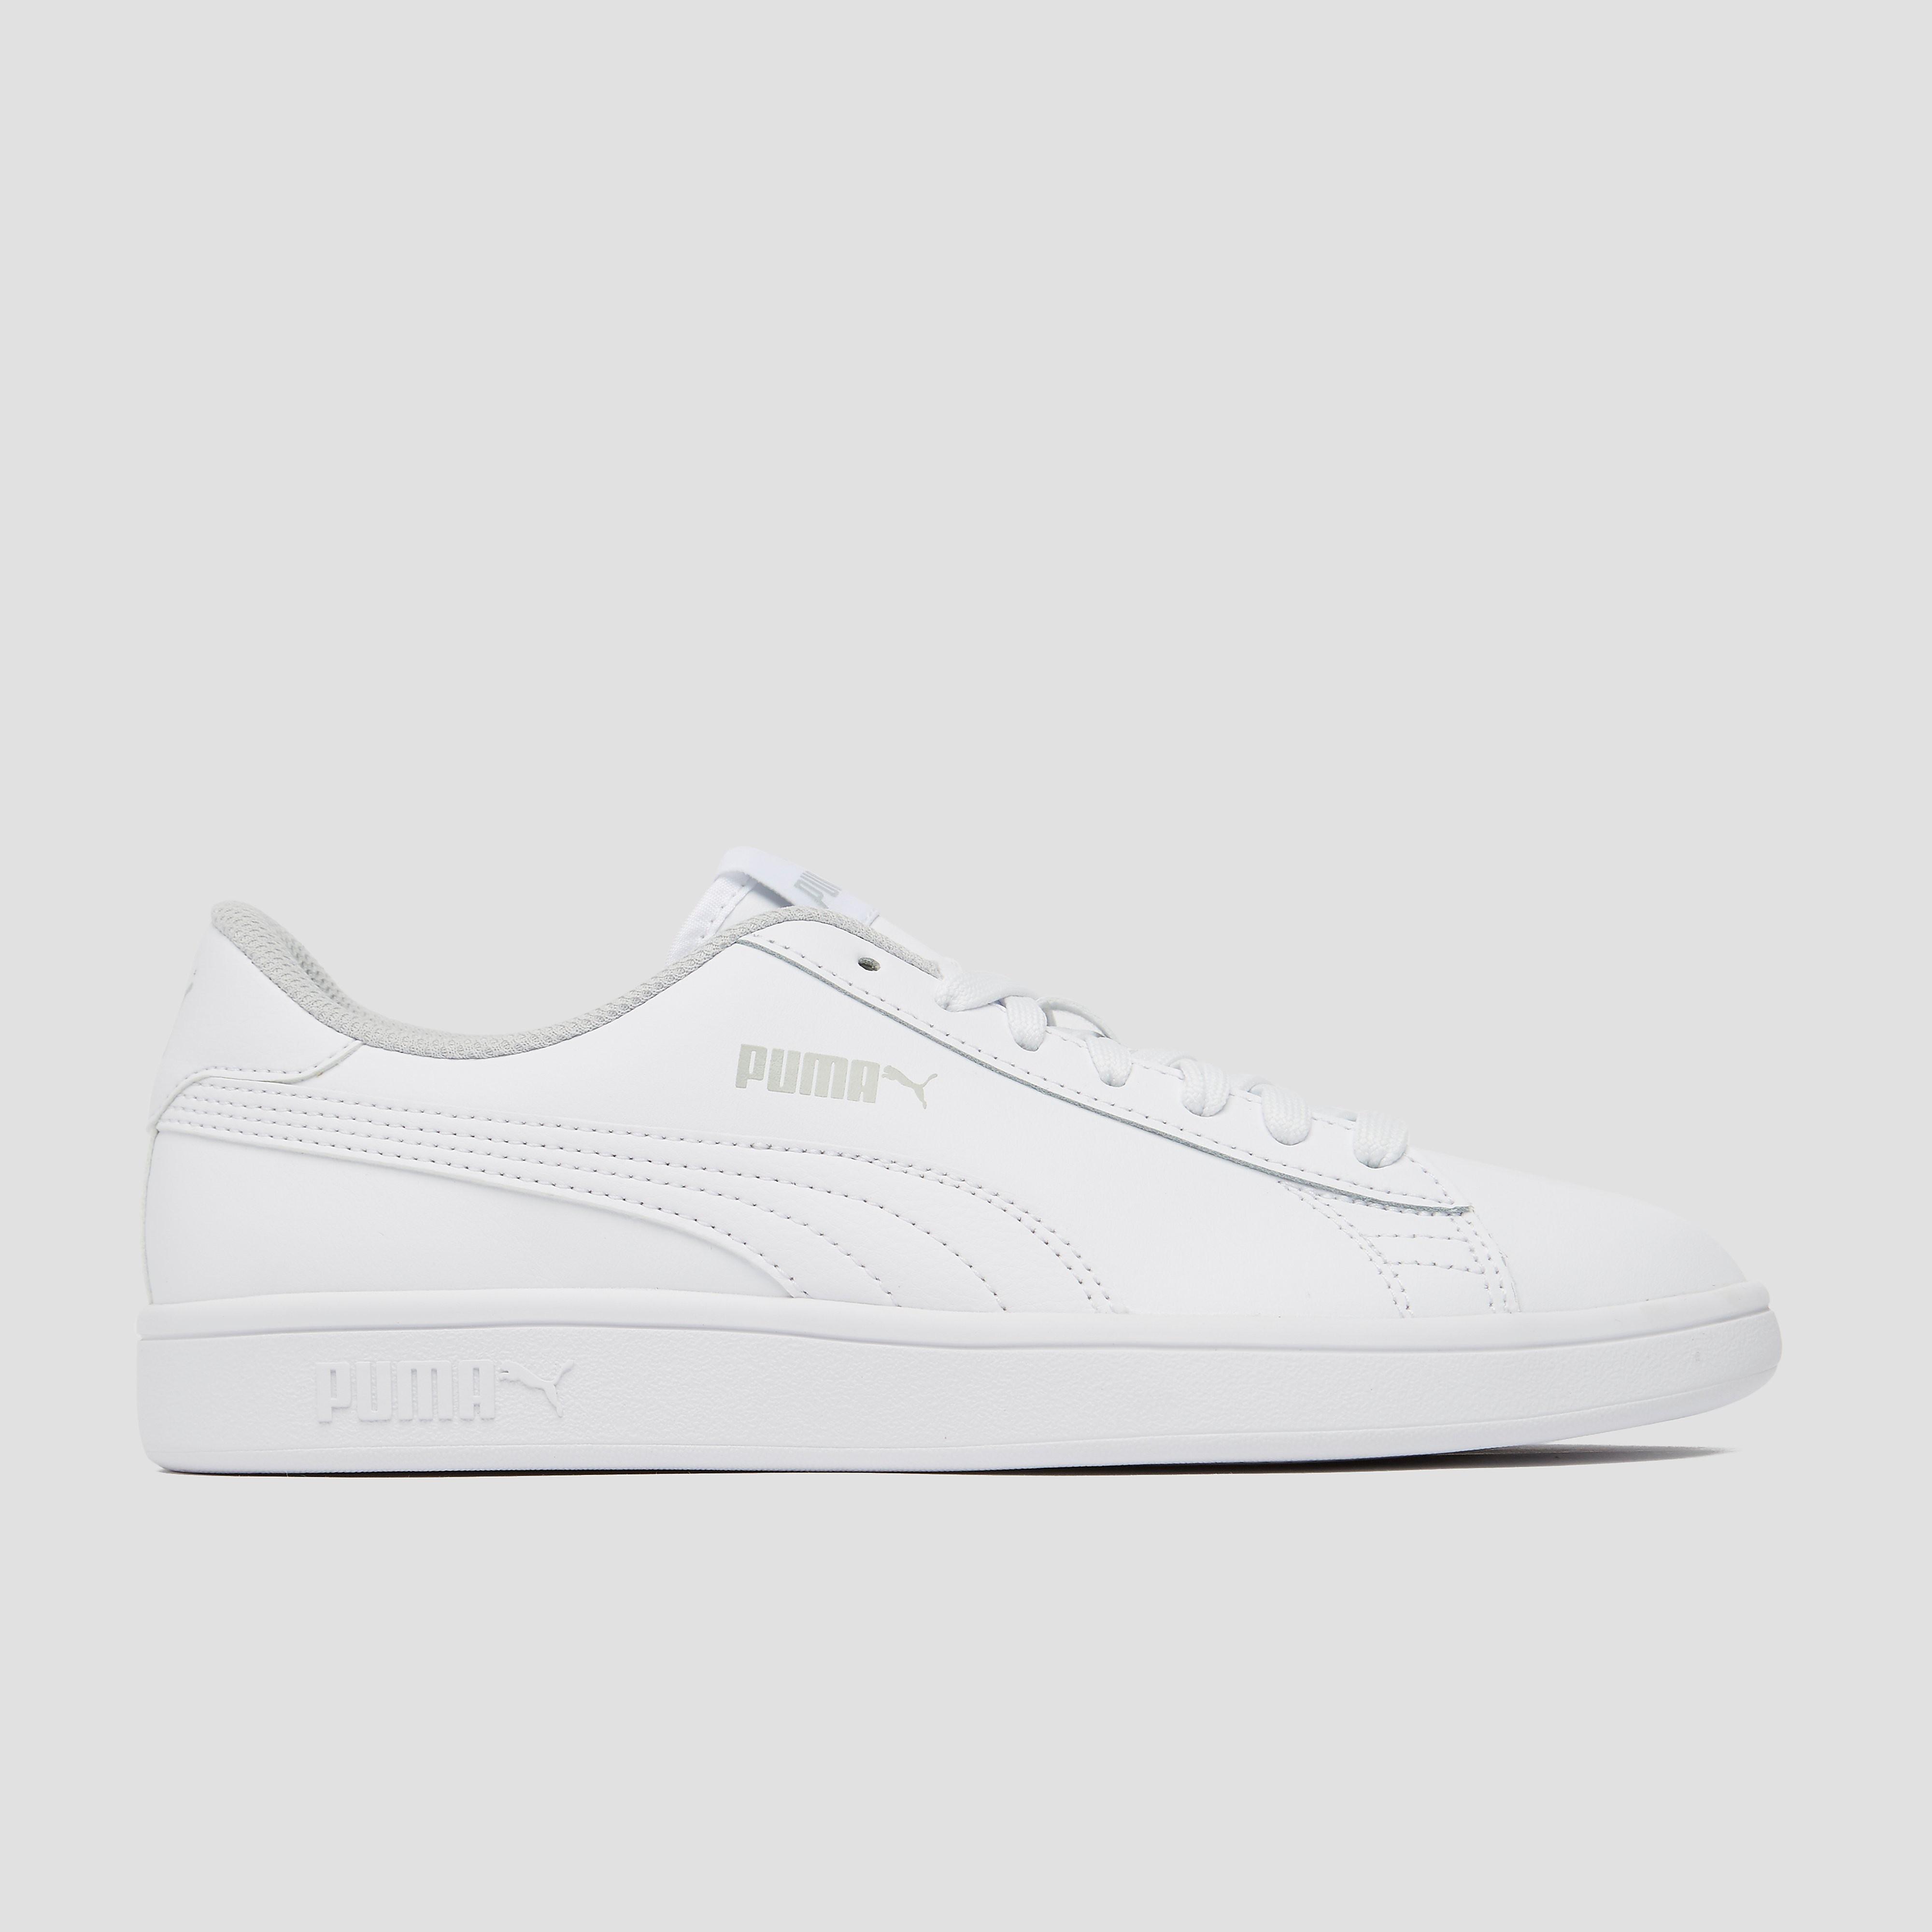 PUMA Smash v2 sneakers wit kinderen online kopen